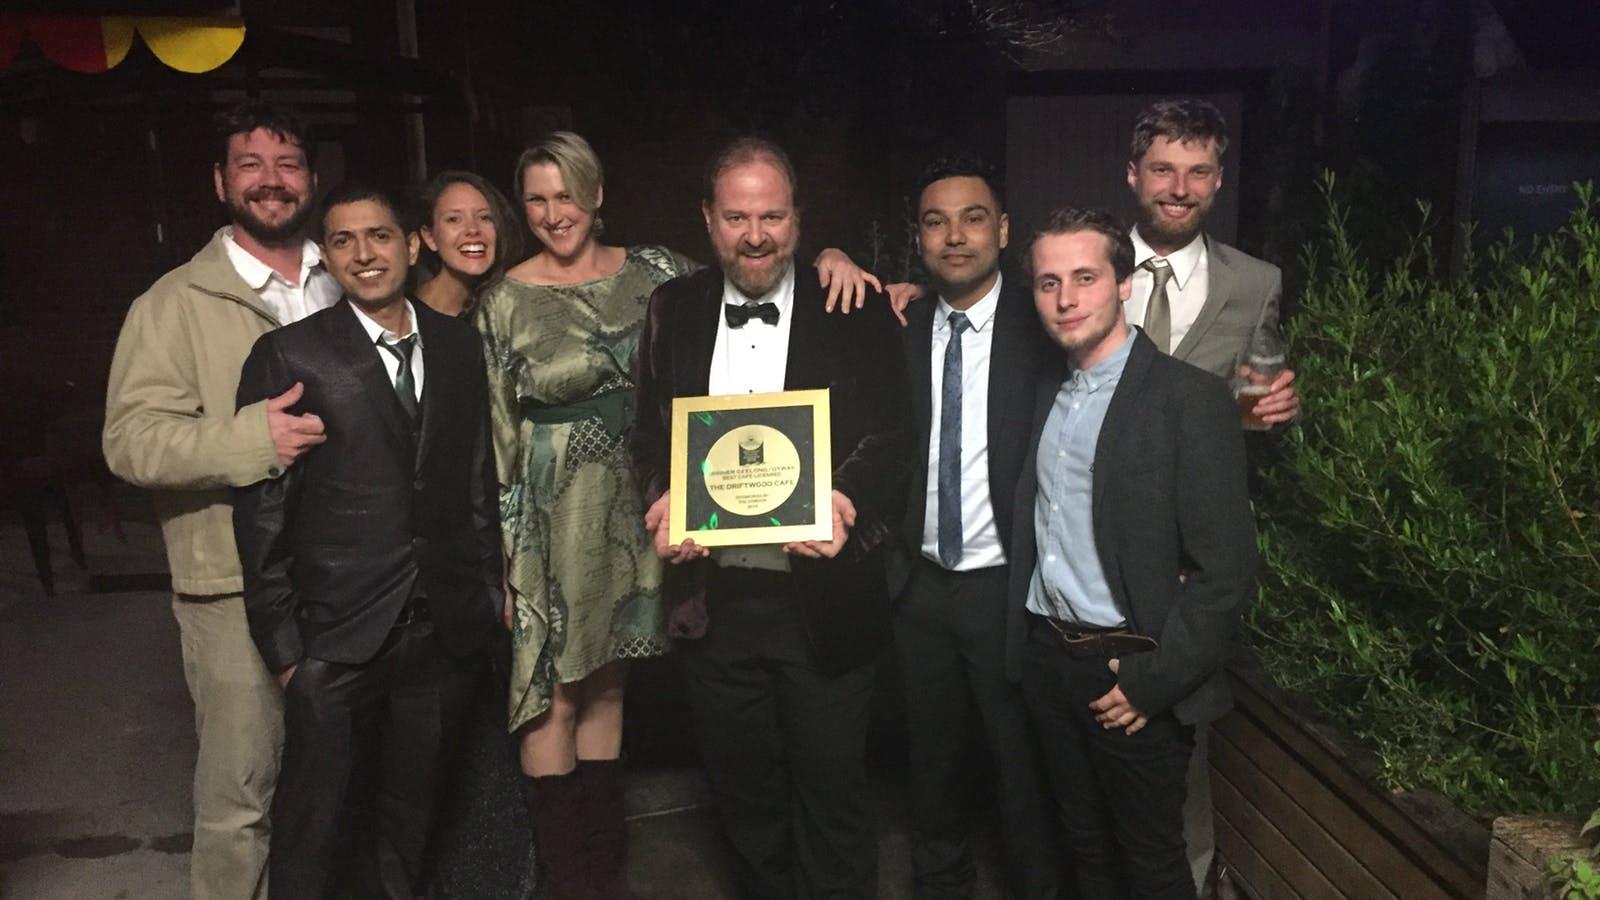 Golden Plate Awards Winners: Best Licenced Cafe